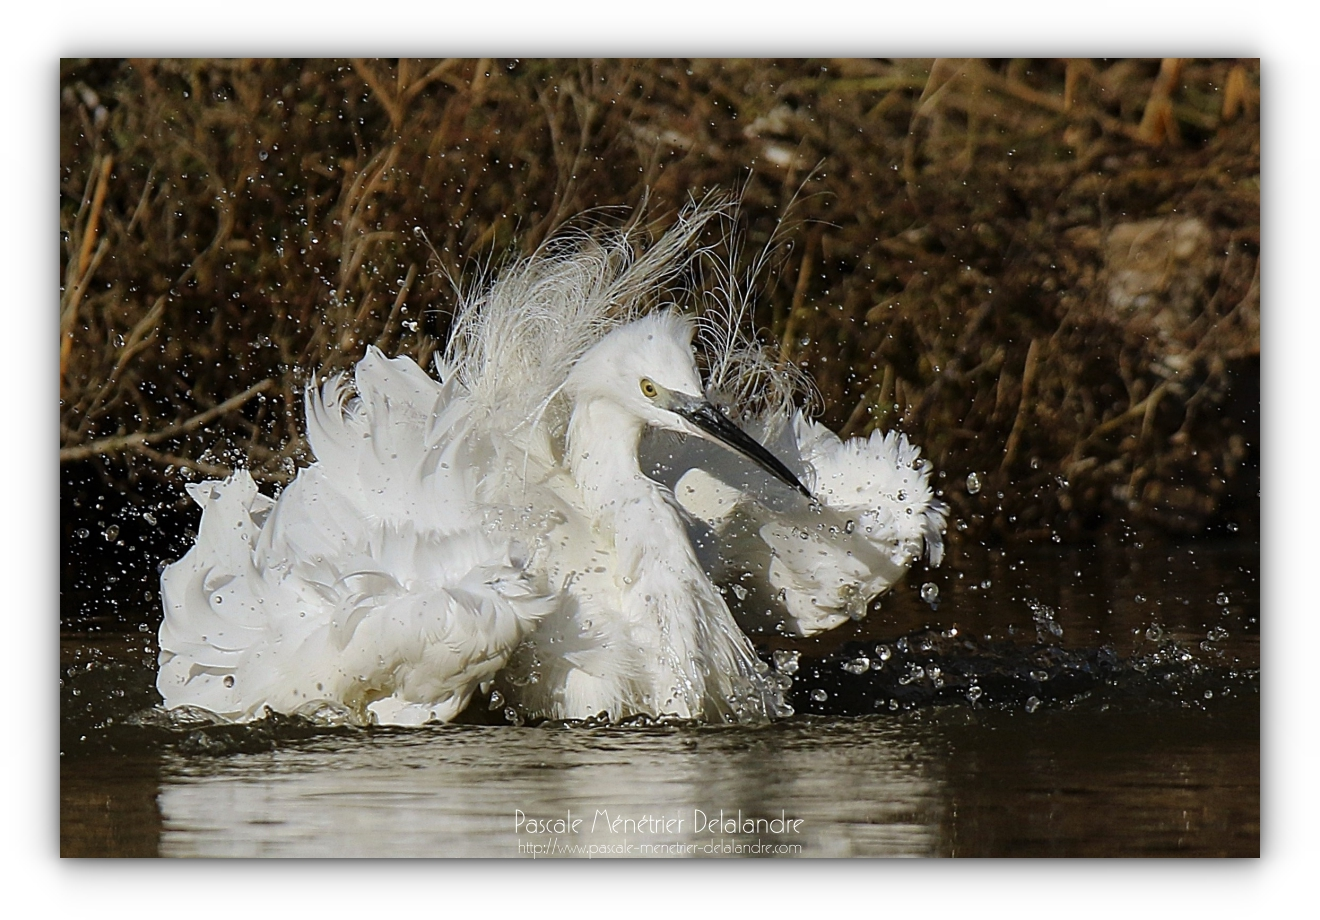 Le bain de l'Aigrette garzette